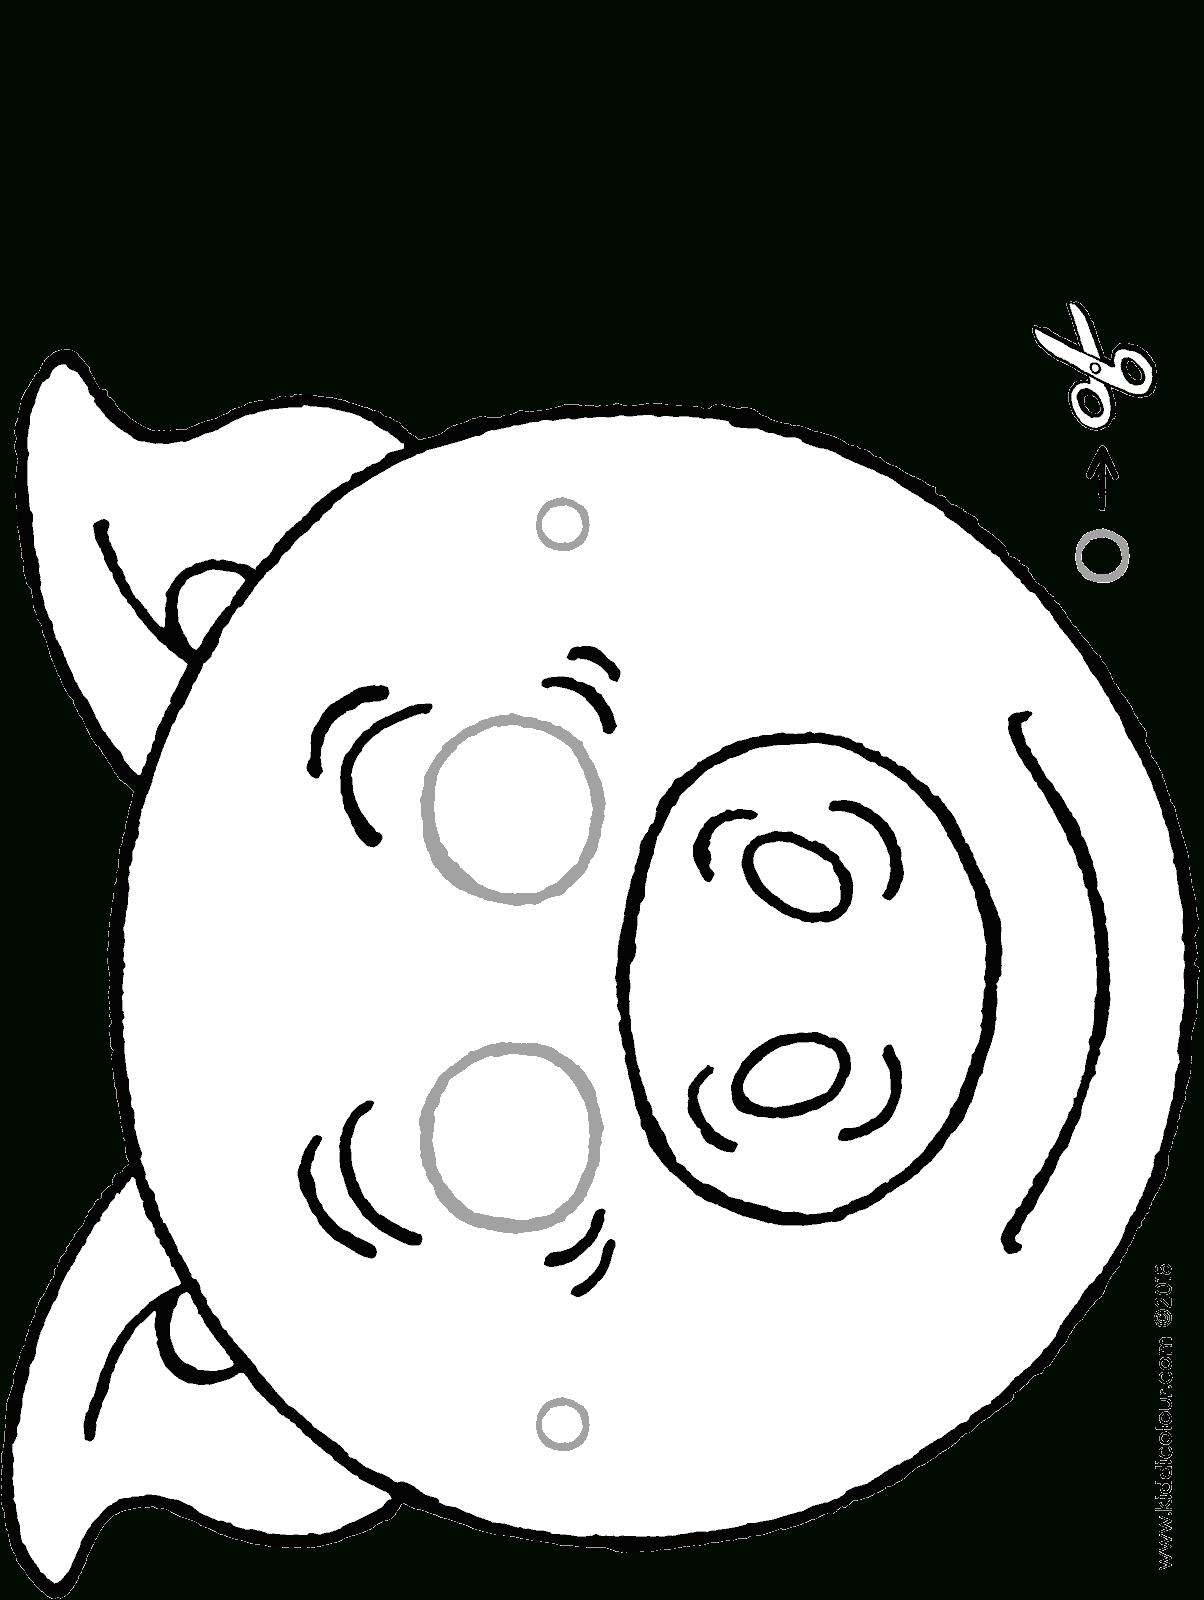 Masque De Cochon - Kiddicoloriage serapportantà Dessin A Colorier Cochon